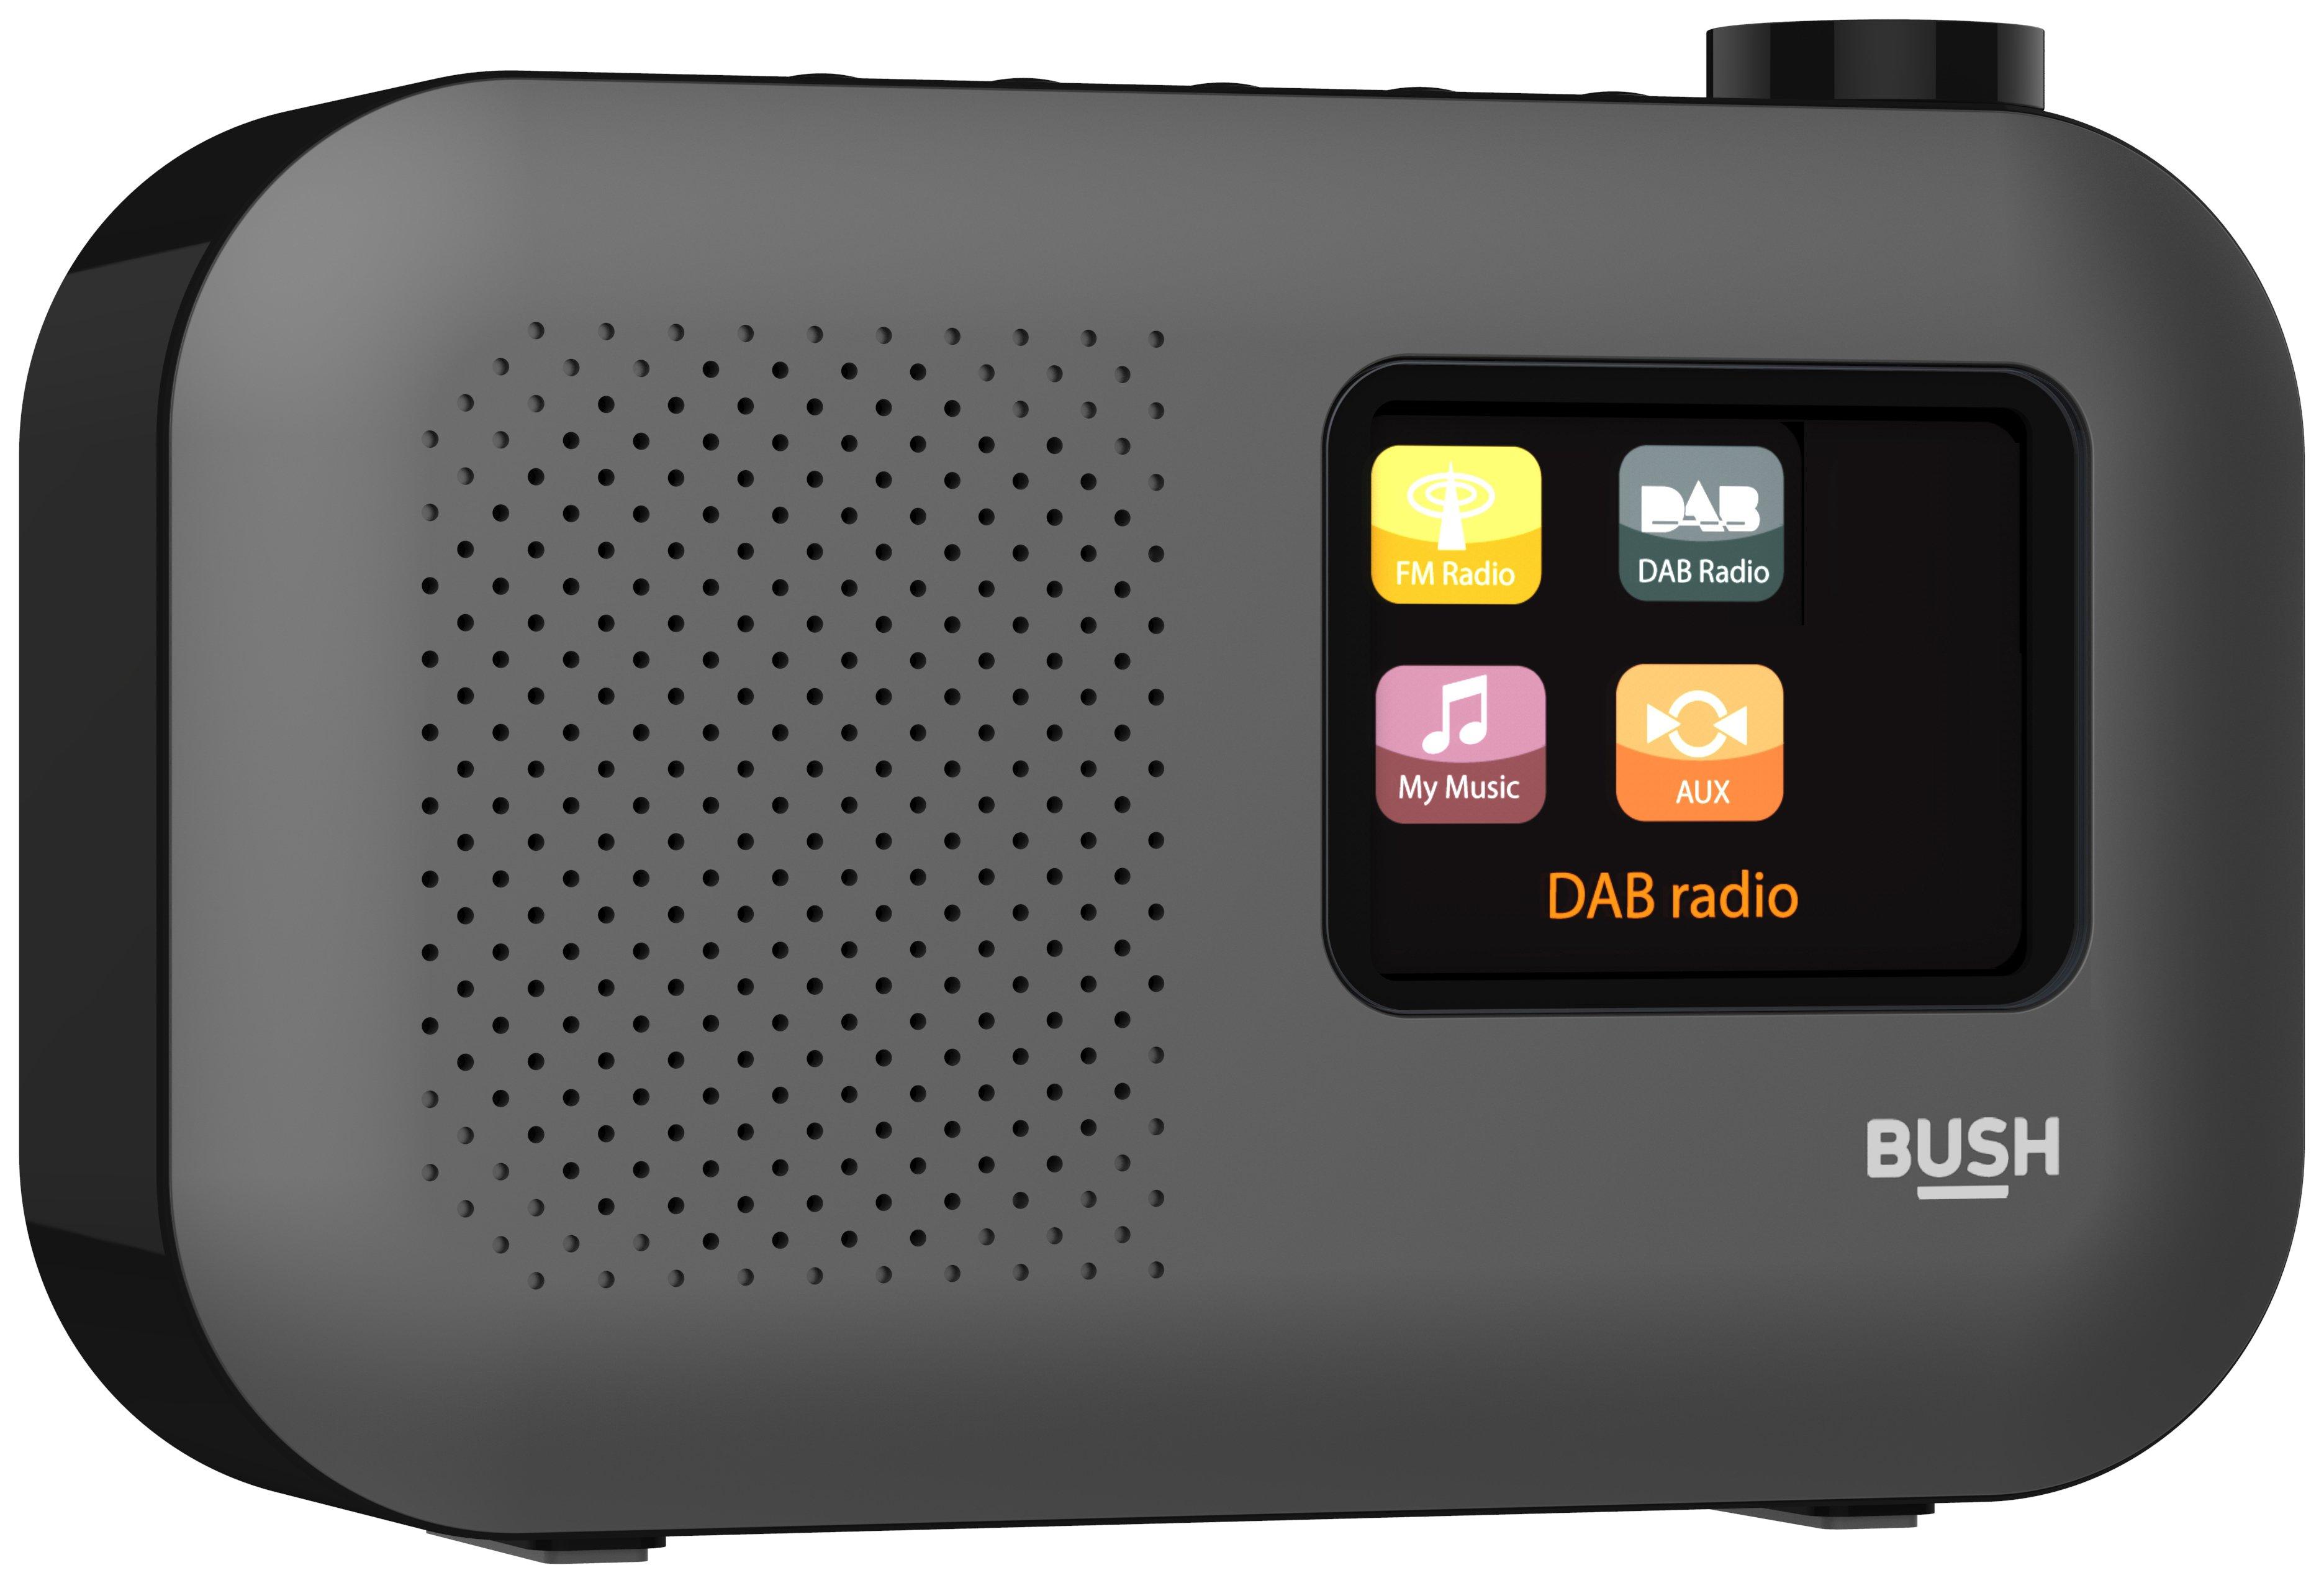 'Bush Colour Screen Dab Radio - Black